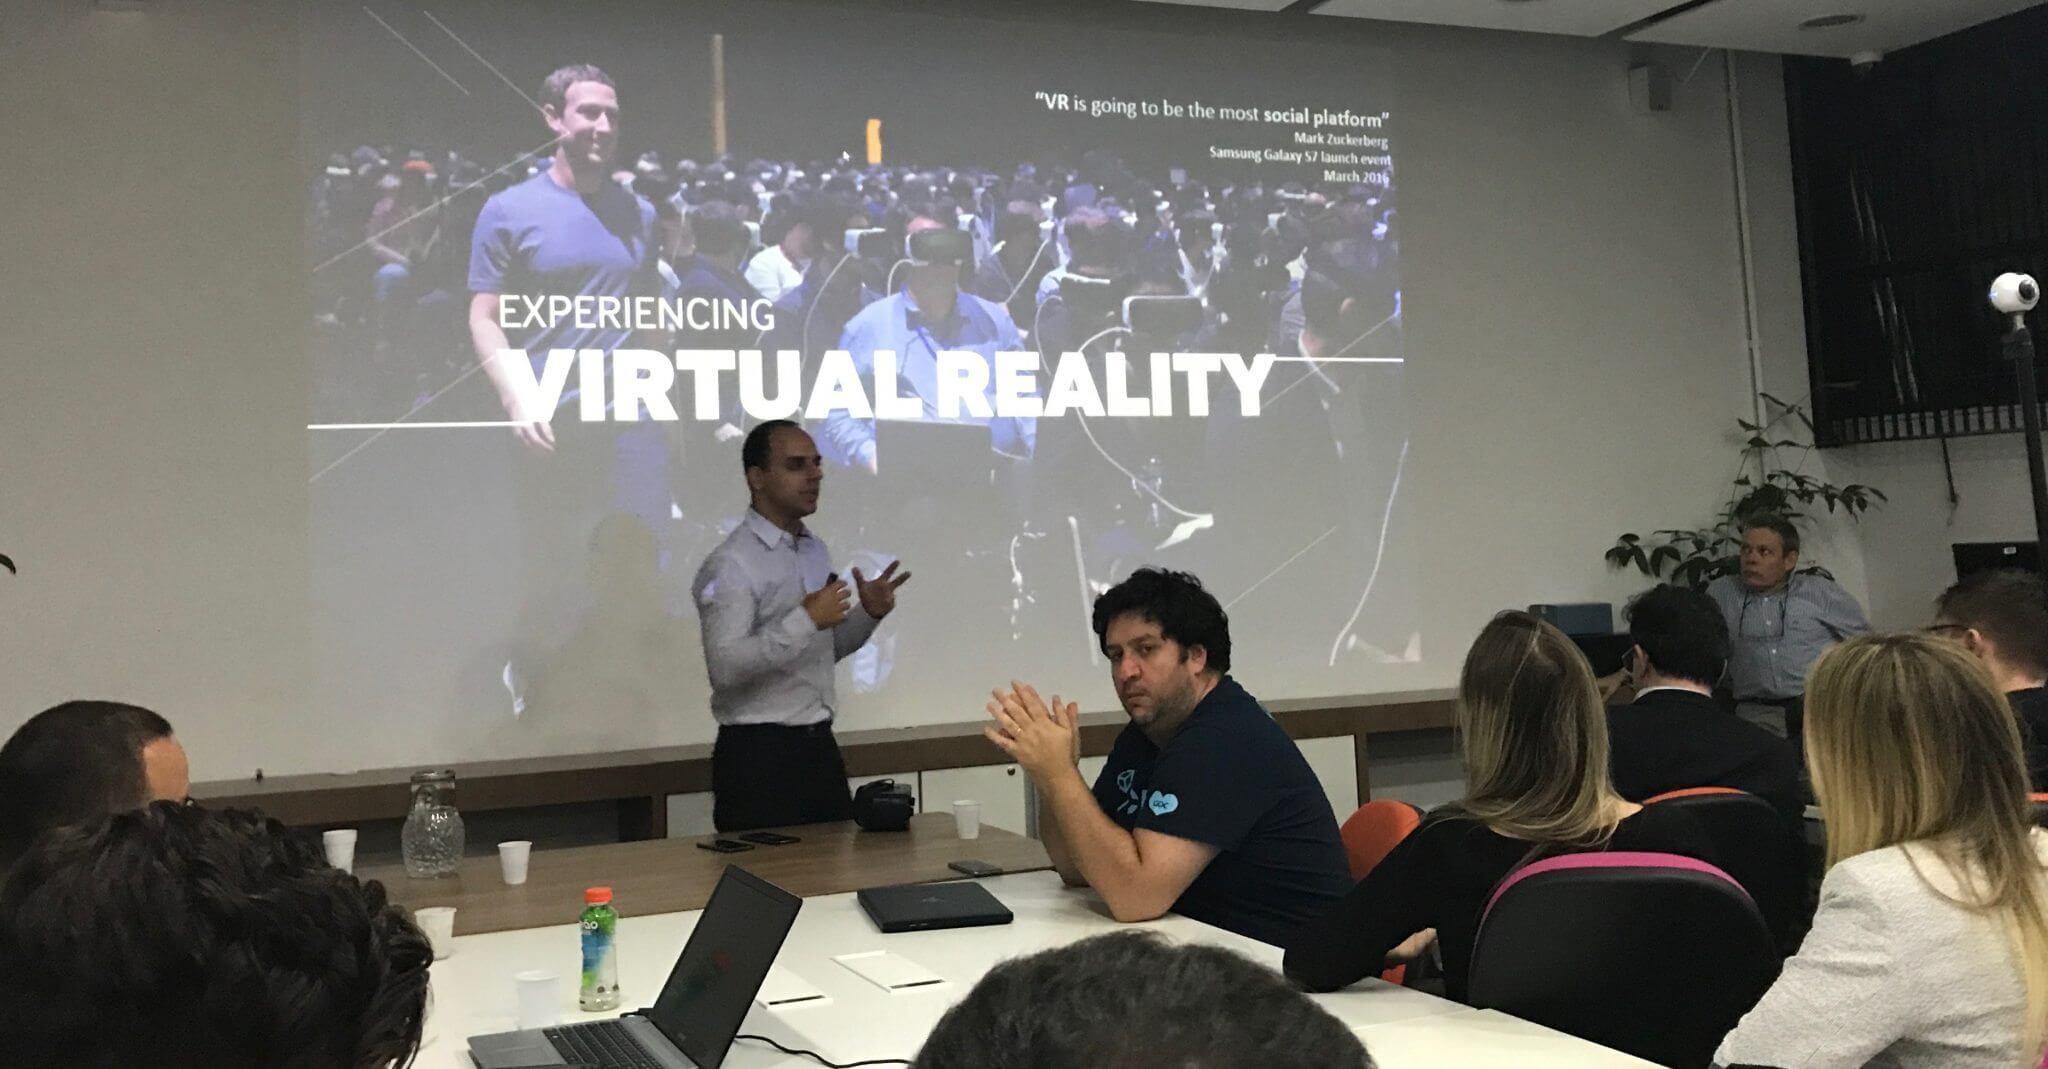 IMG 1691 - Como a Realidade Virtual vai revolucionar as nossas vidas?